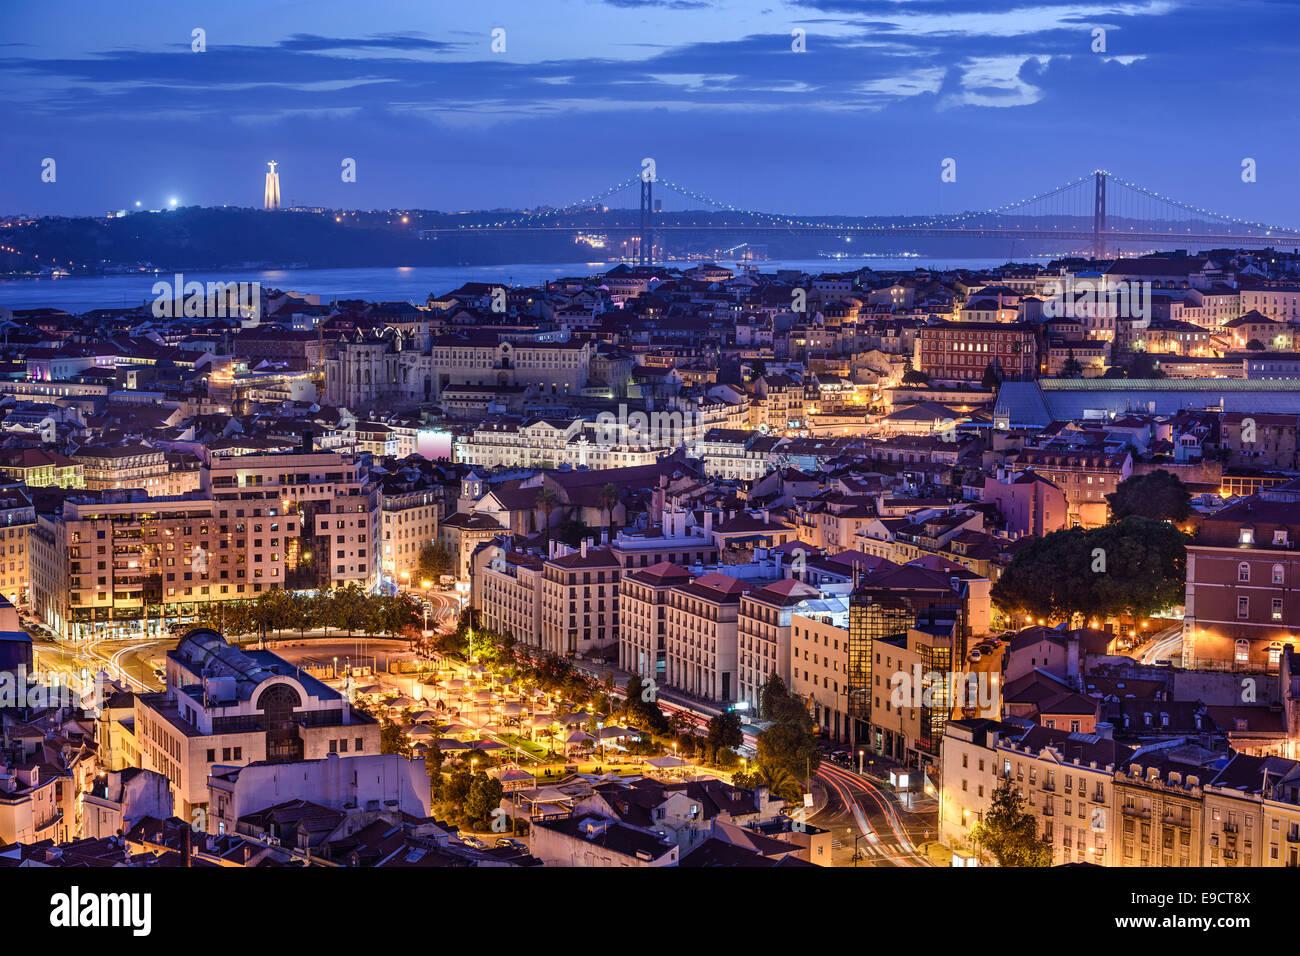 Lisboa, Portugal skyline en la noche. Imagen De Stock